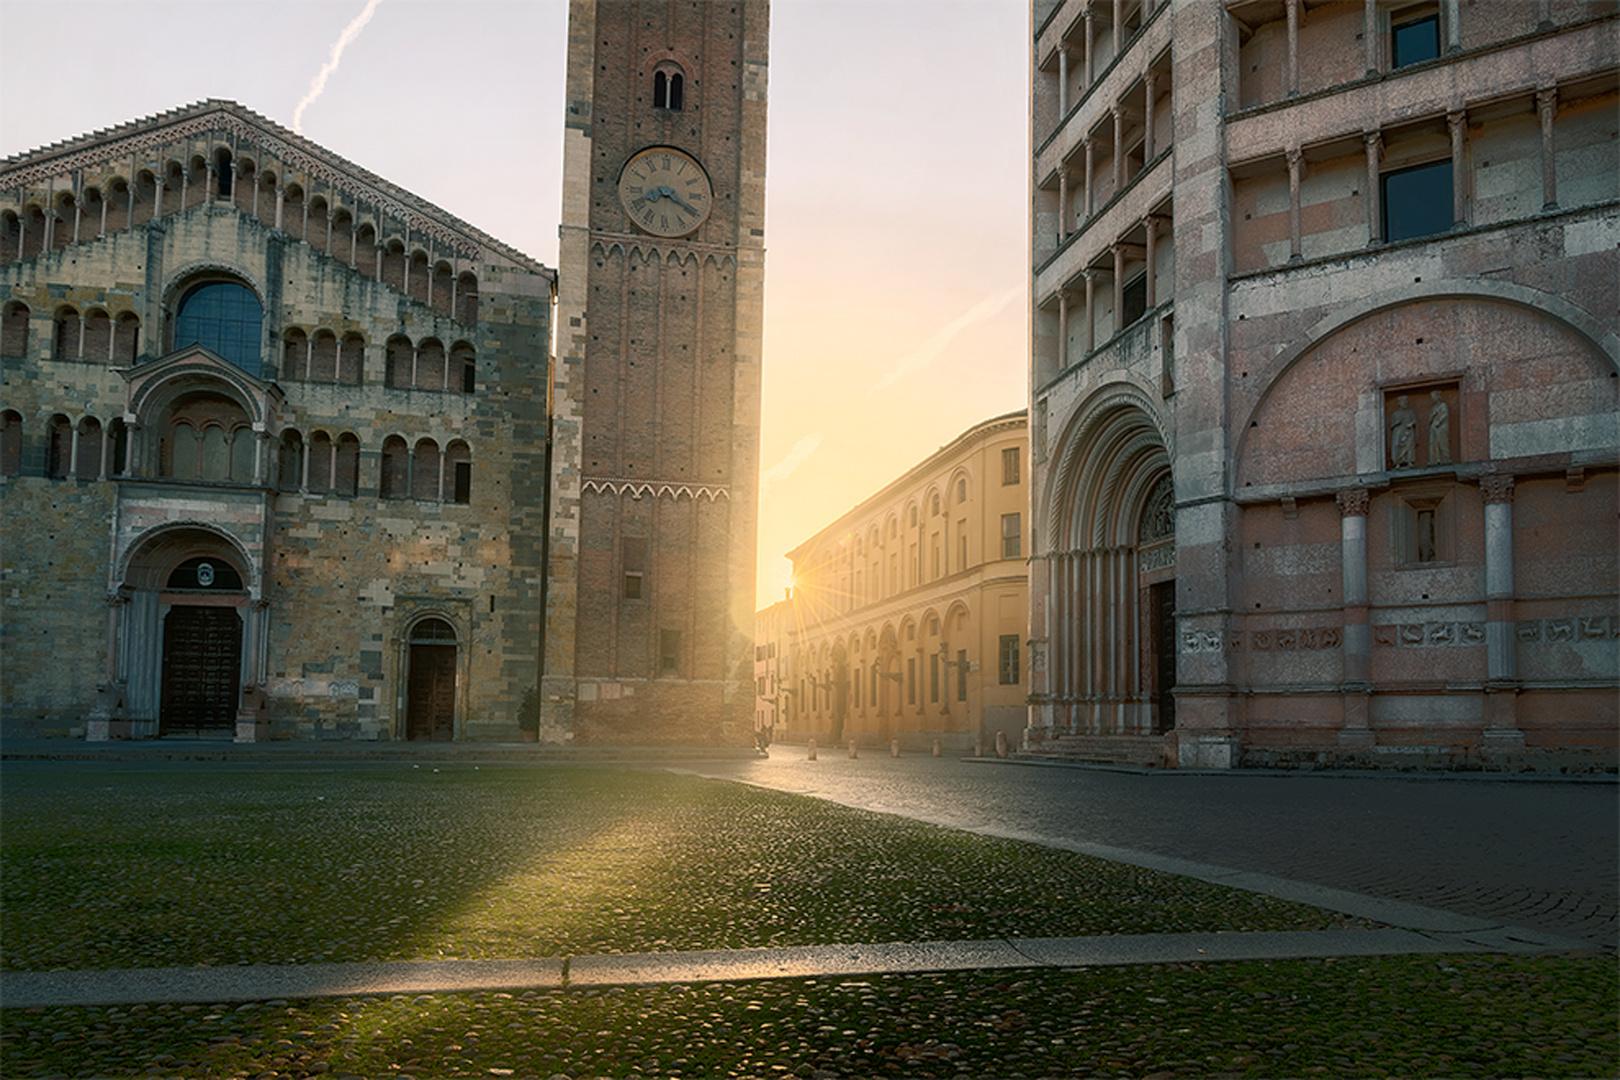 Piazza Duomo di Parma